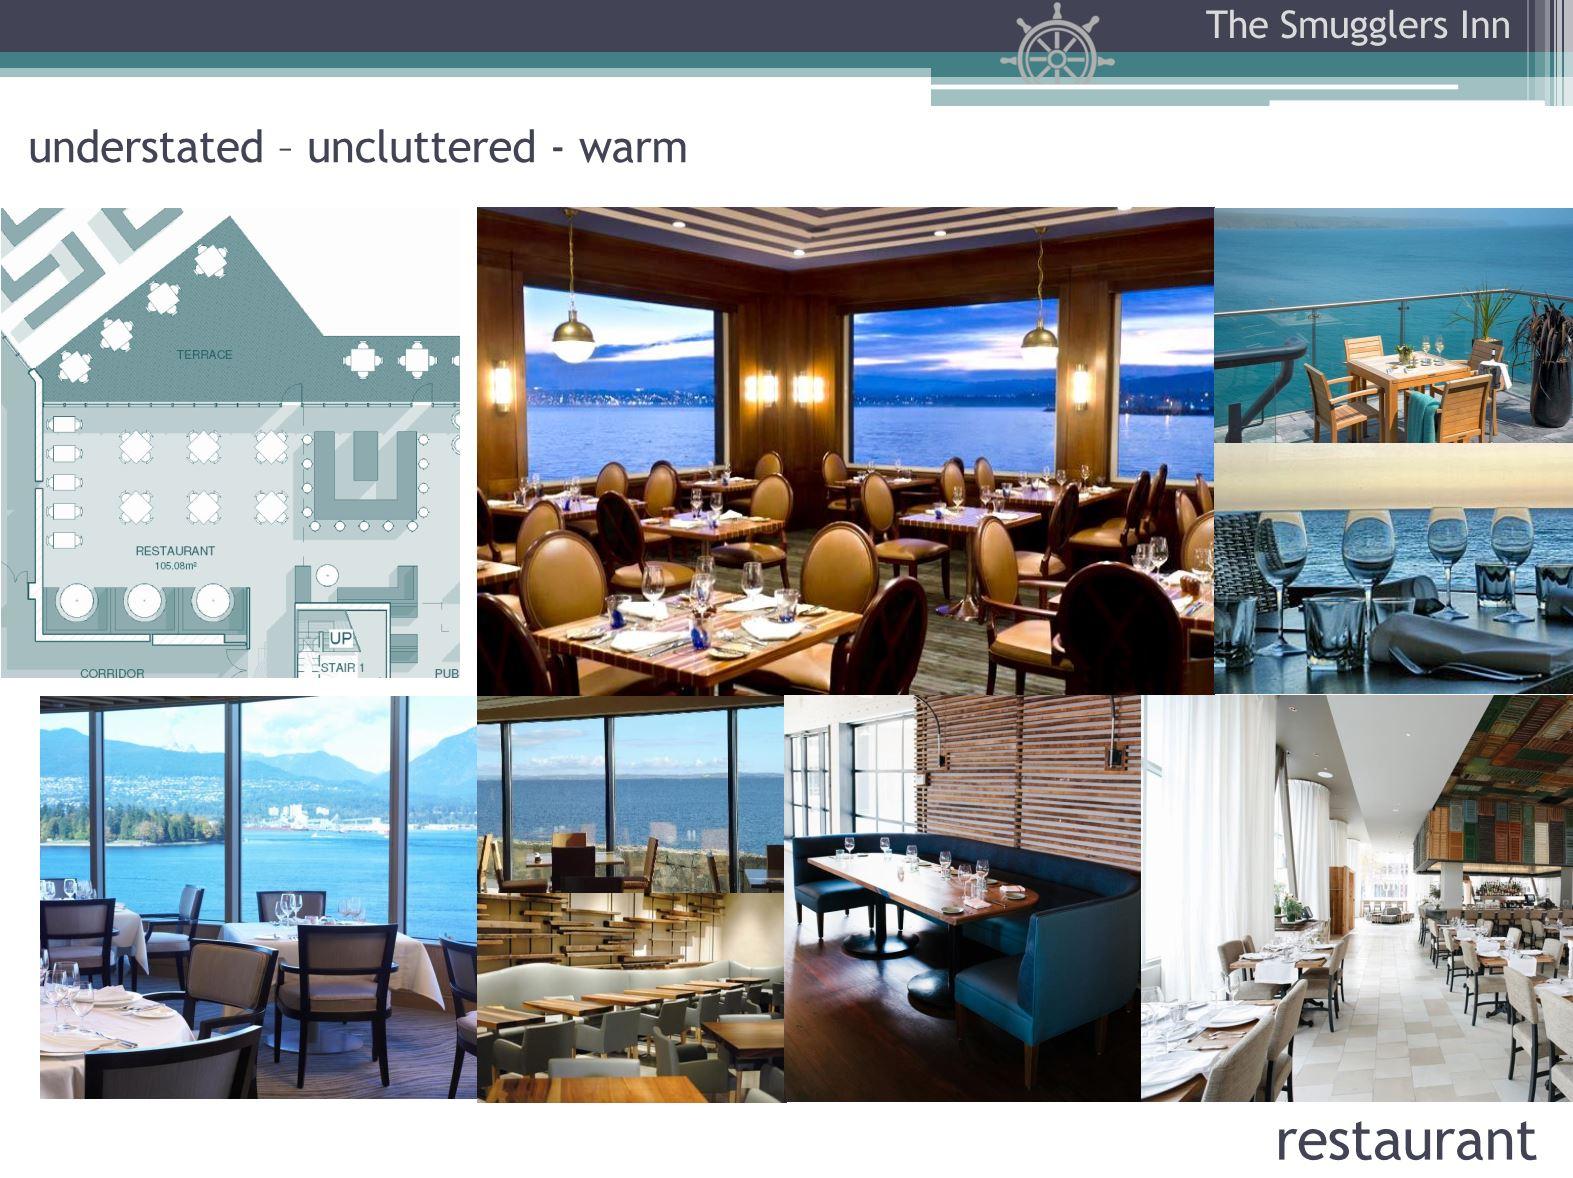 Hotel Fitout-Smugglers Inn-Mood Board-Restaurant